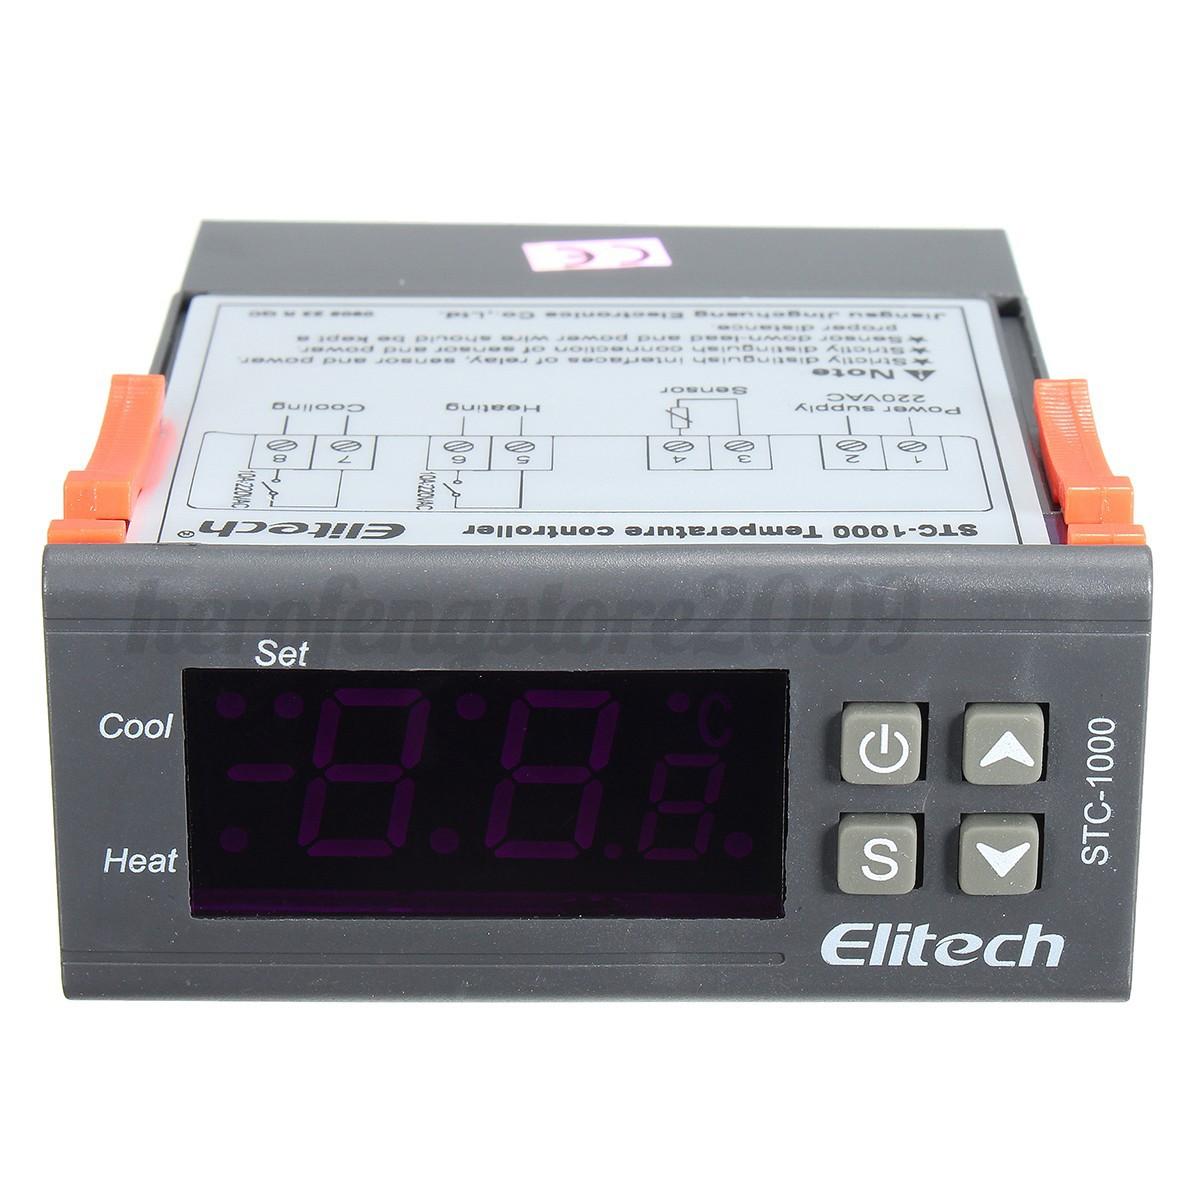 LCD Digital Temperature Controller Thermostat Sensor Alarm 220V eBay #C03A0B